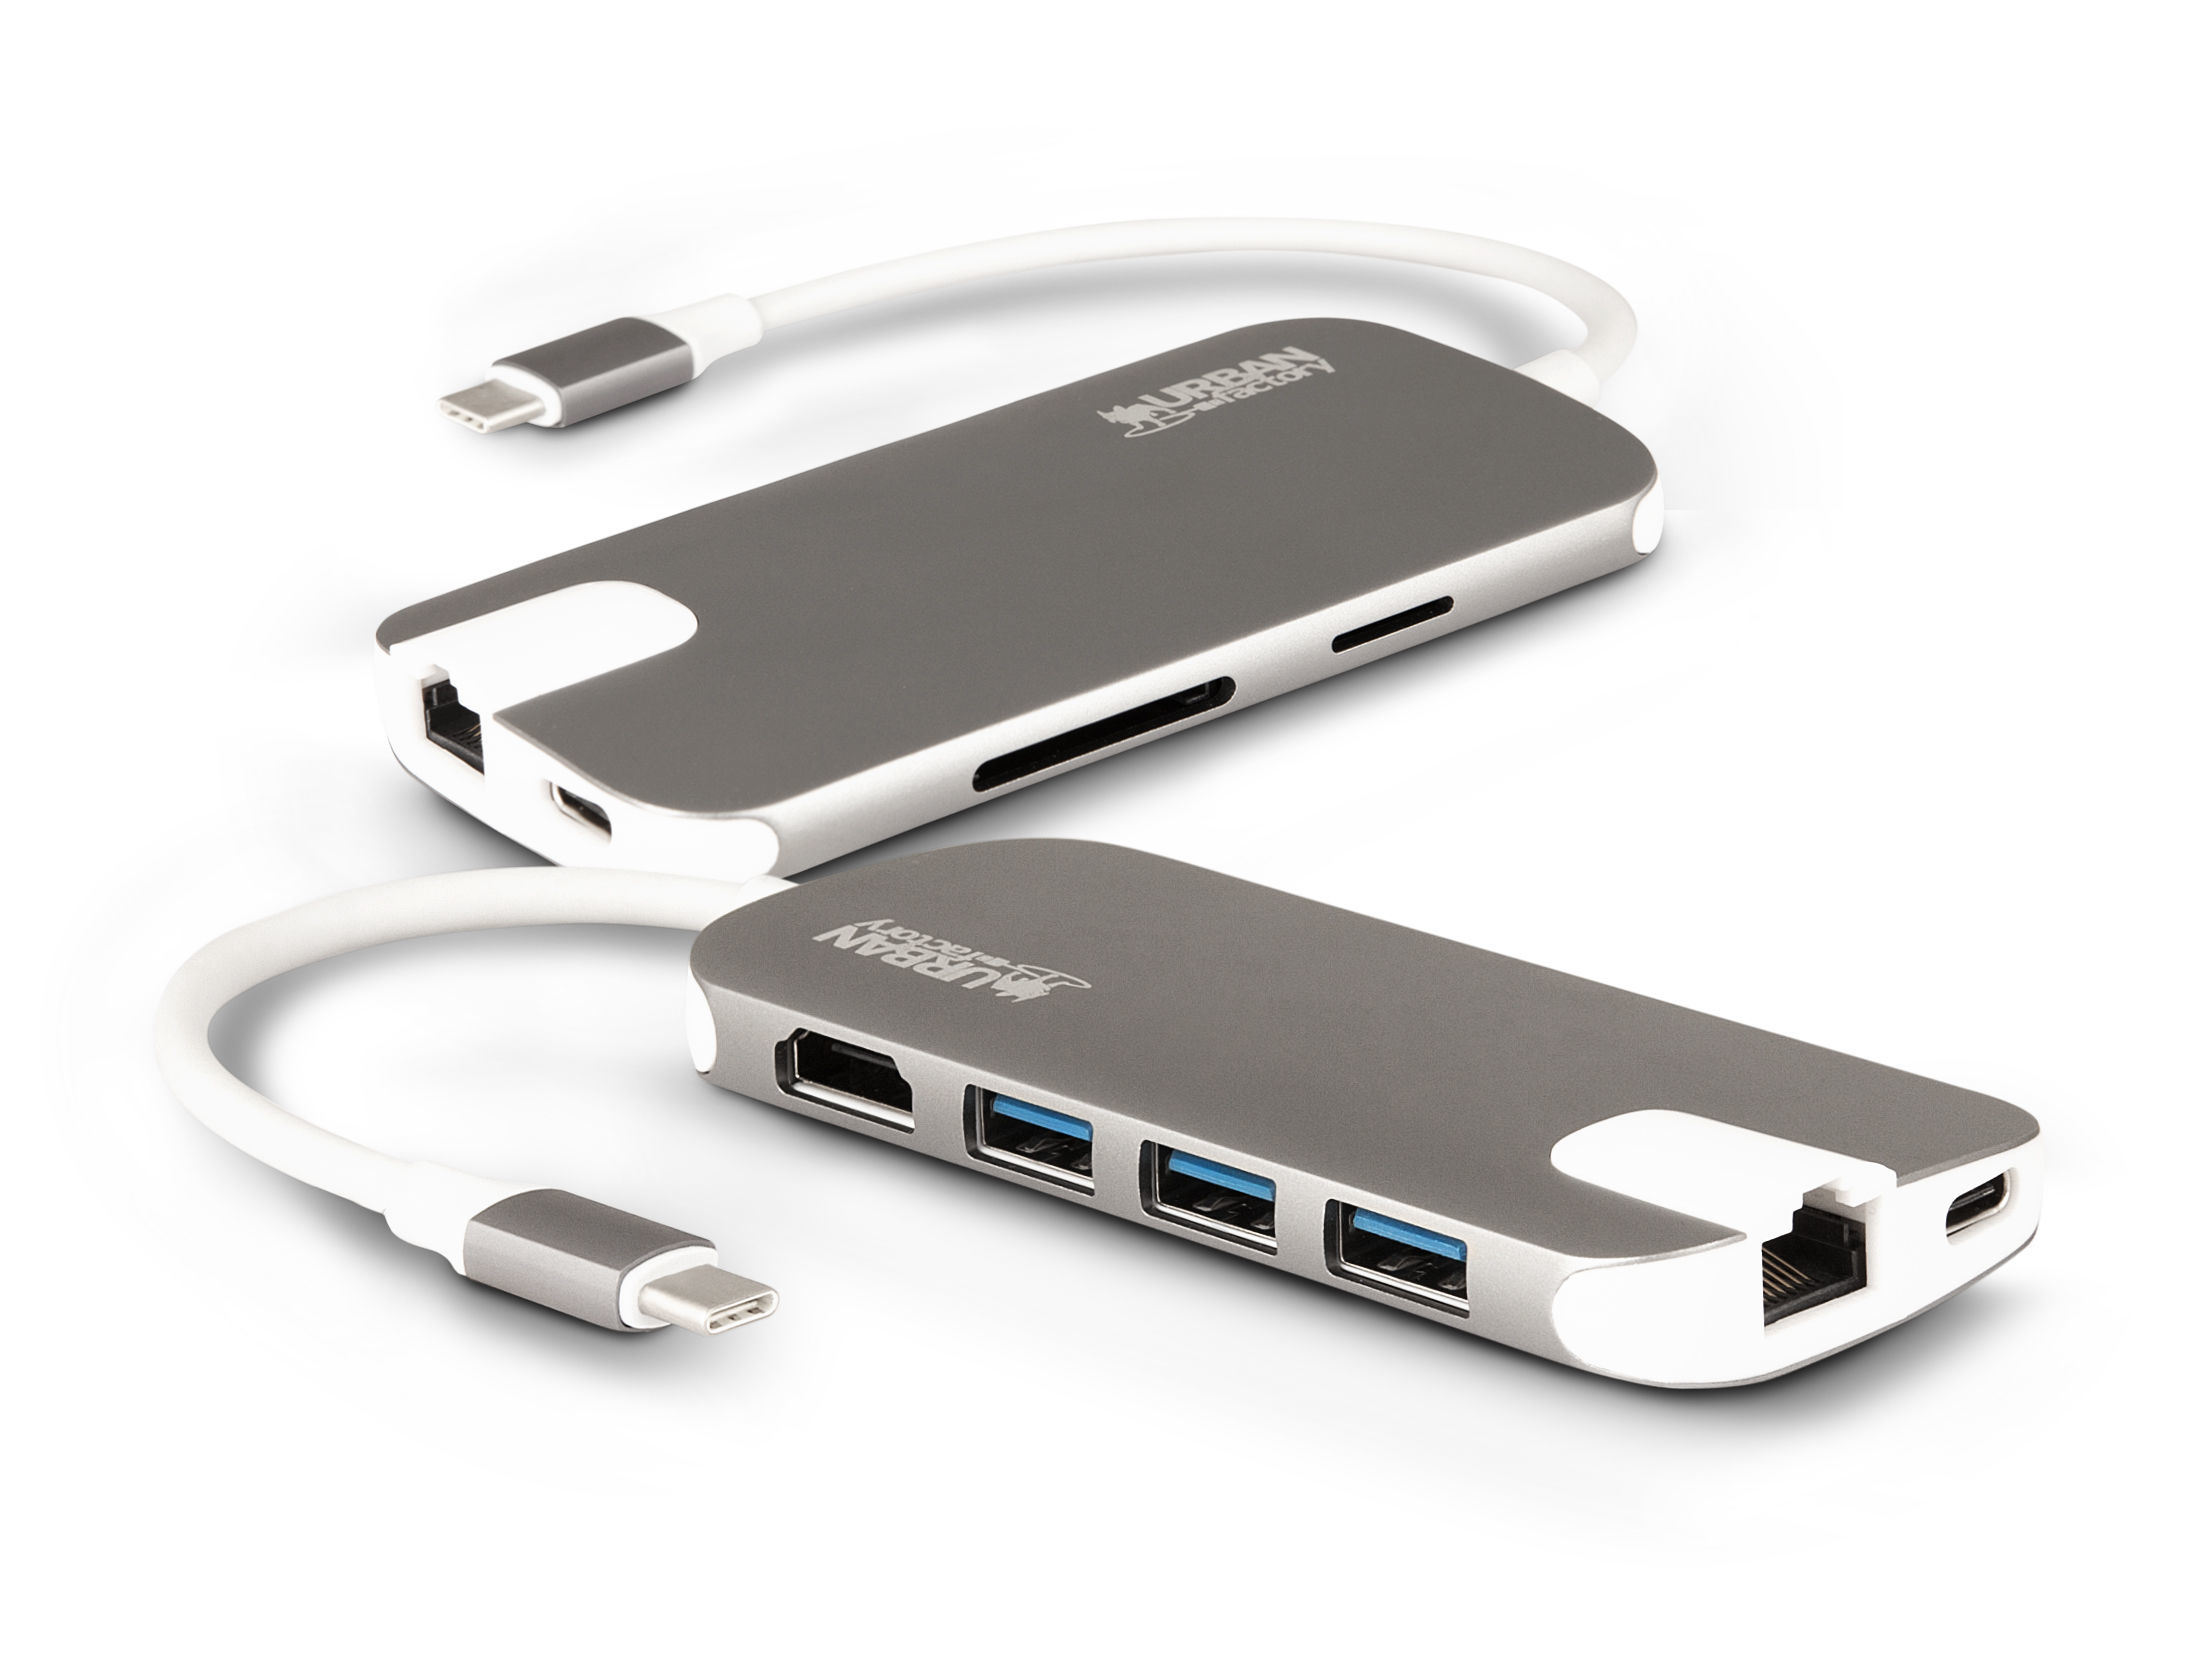 Station d'accueil mobile USB-C - USB 3.0 - 45W